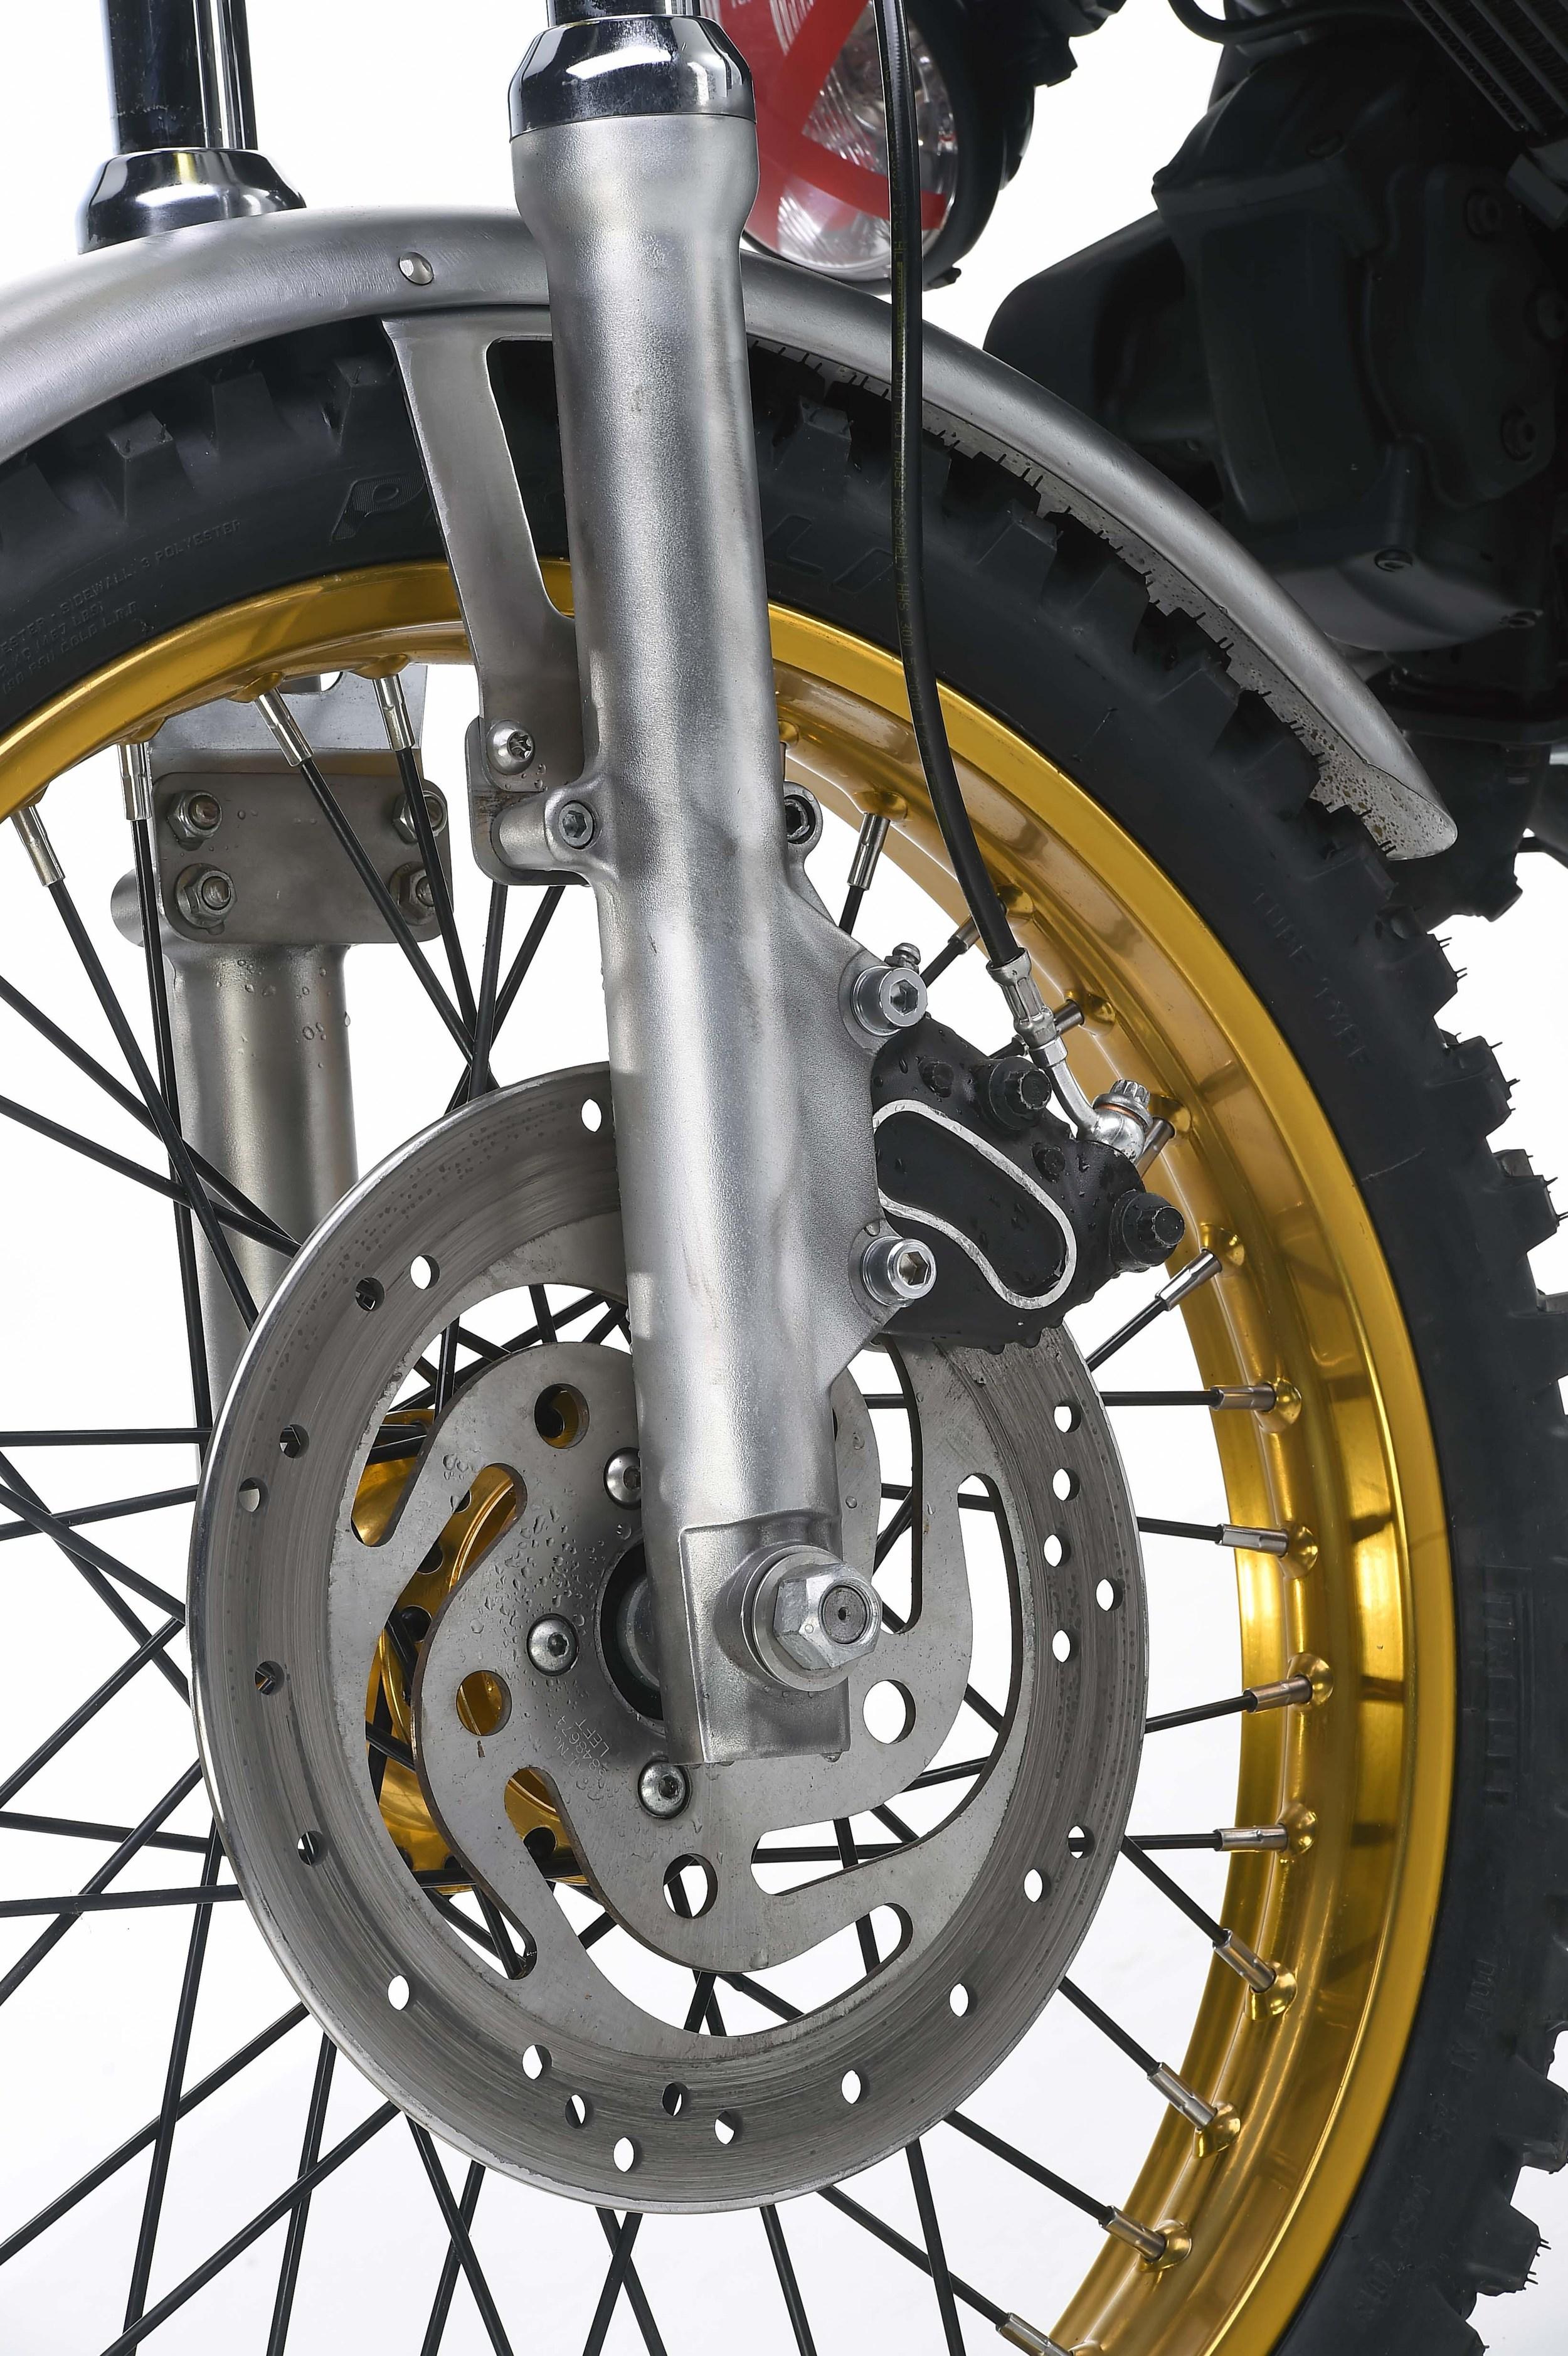 Ducati-Scrambler-Scratch-Concept-Officine-Mermaid-Dario-Mastroianni-02.jpg